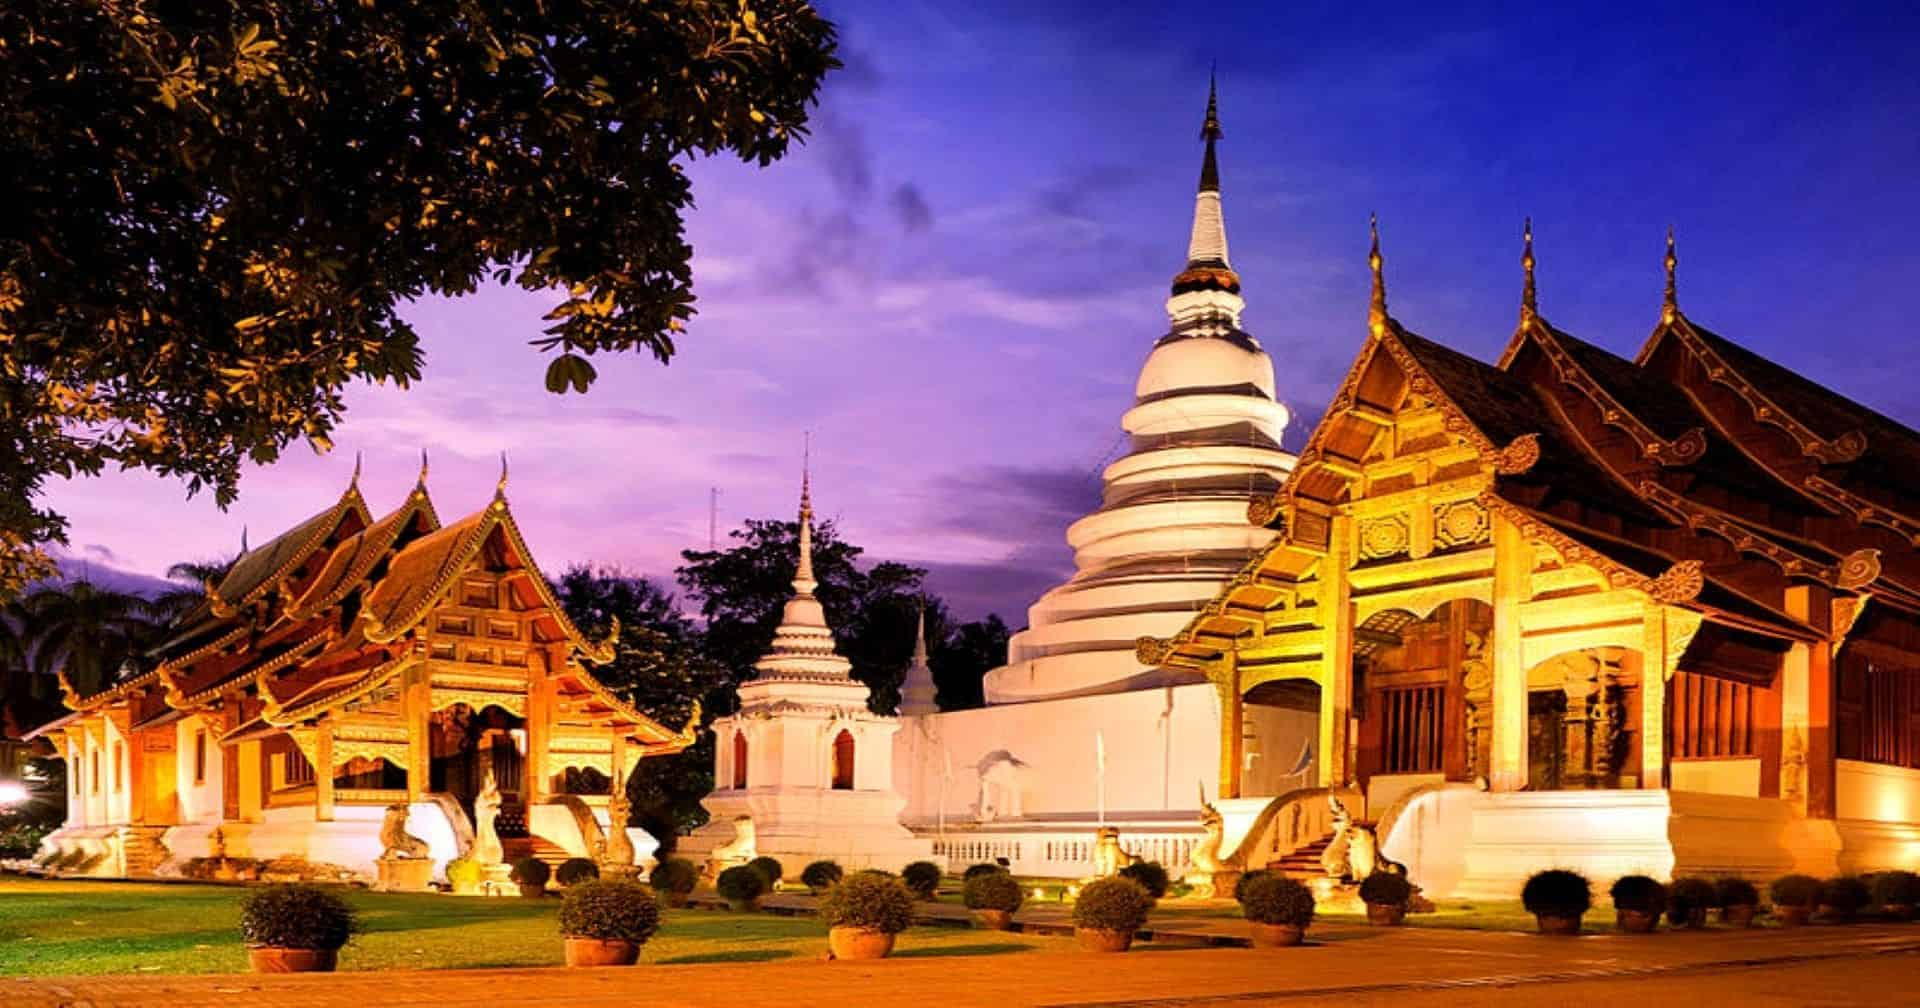 Phra Singh Temple Chiang Ma